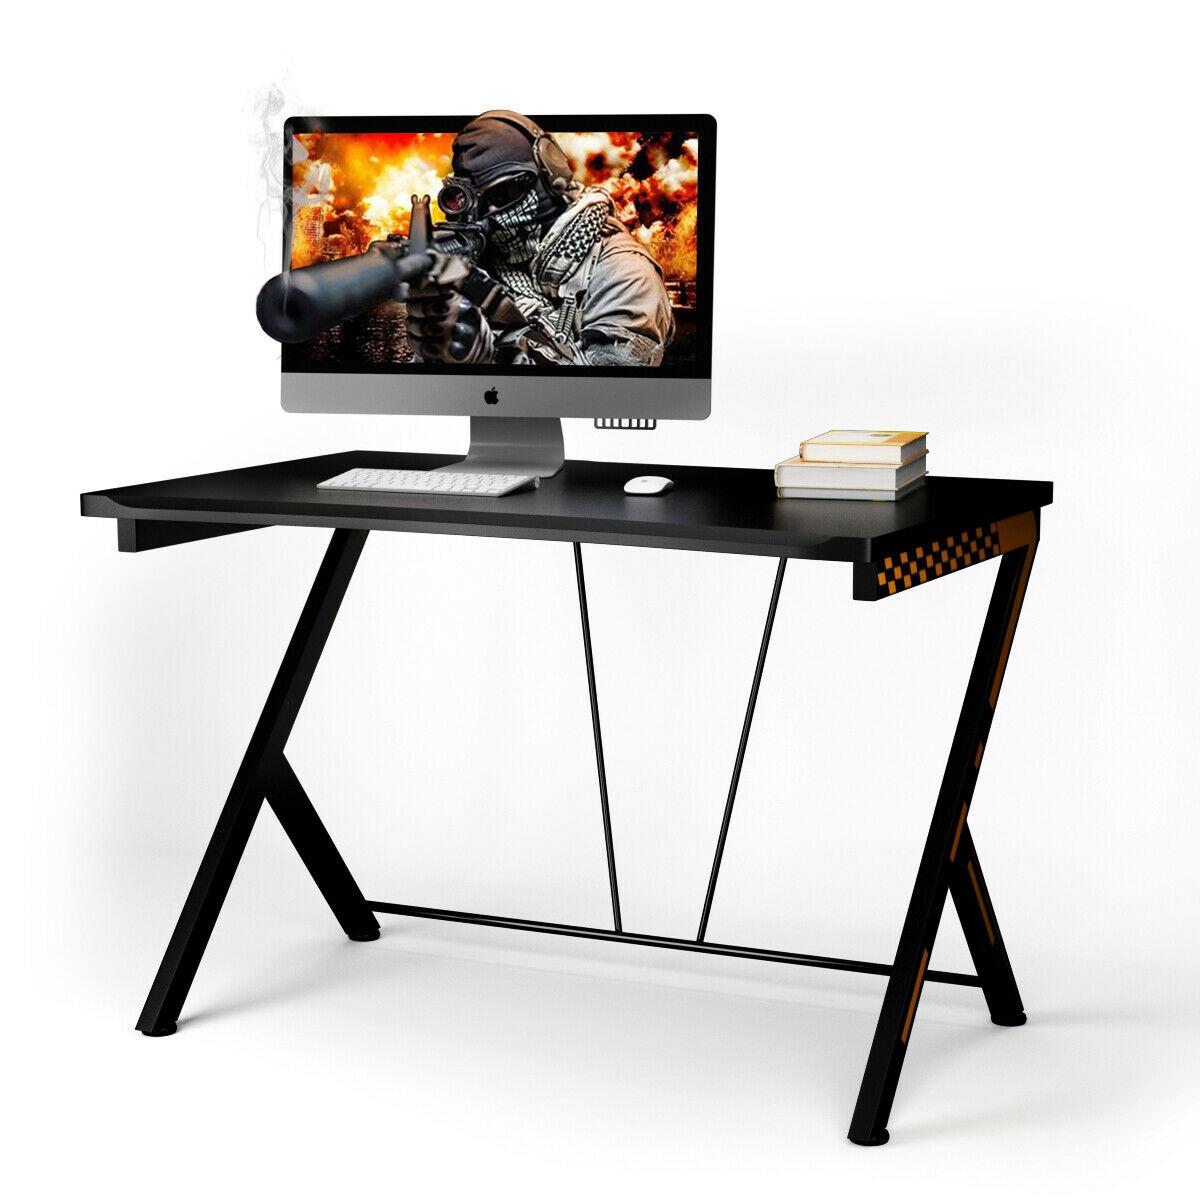 Costway Gaming Desk Computer Desk PC Laptop Table Workstation Home Office Ergonomic New